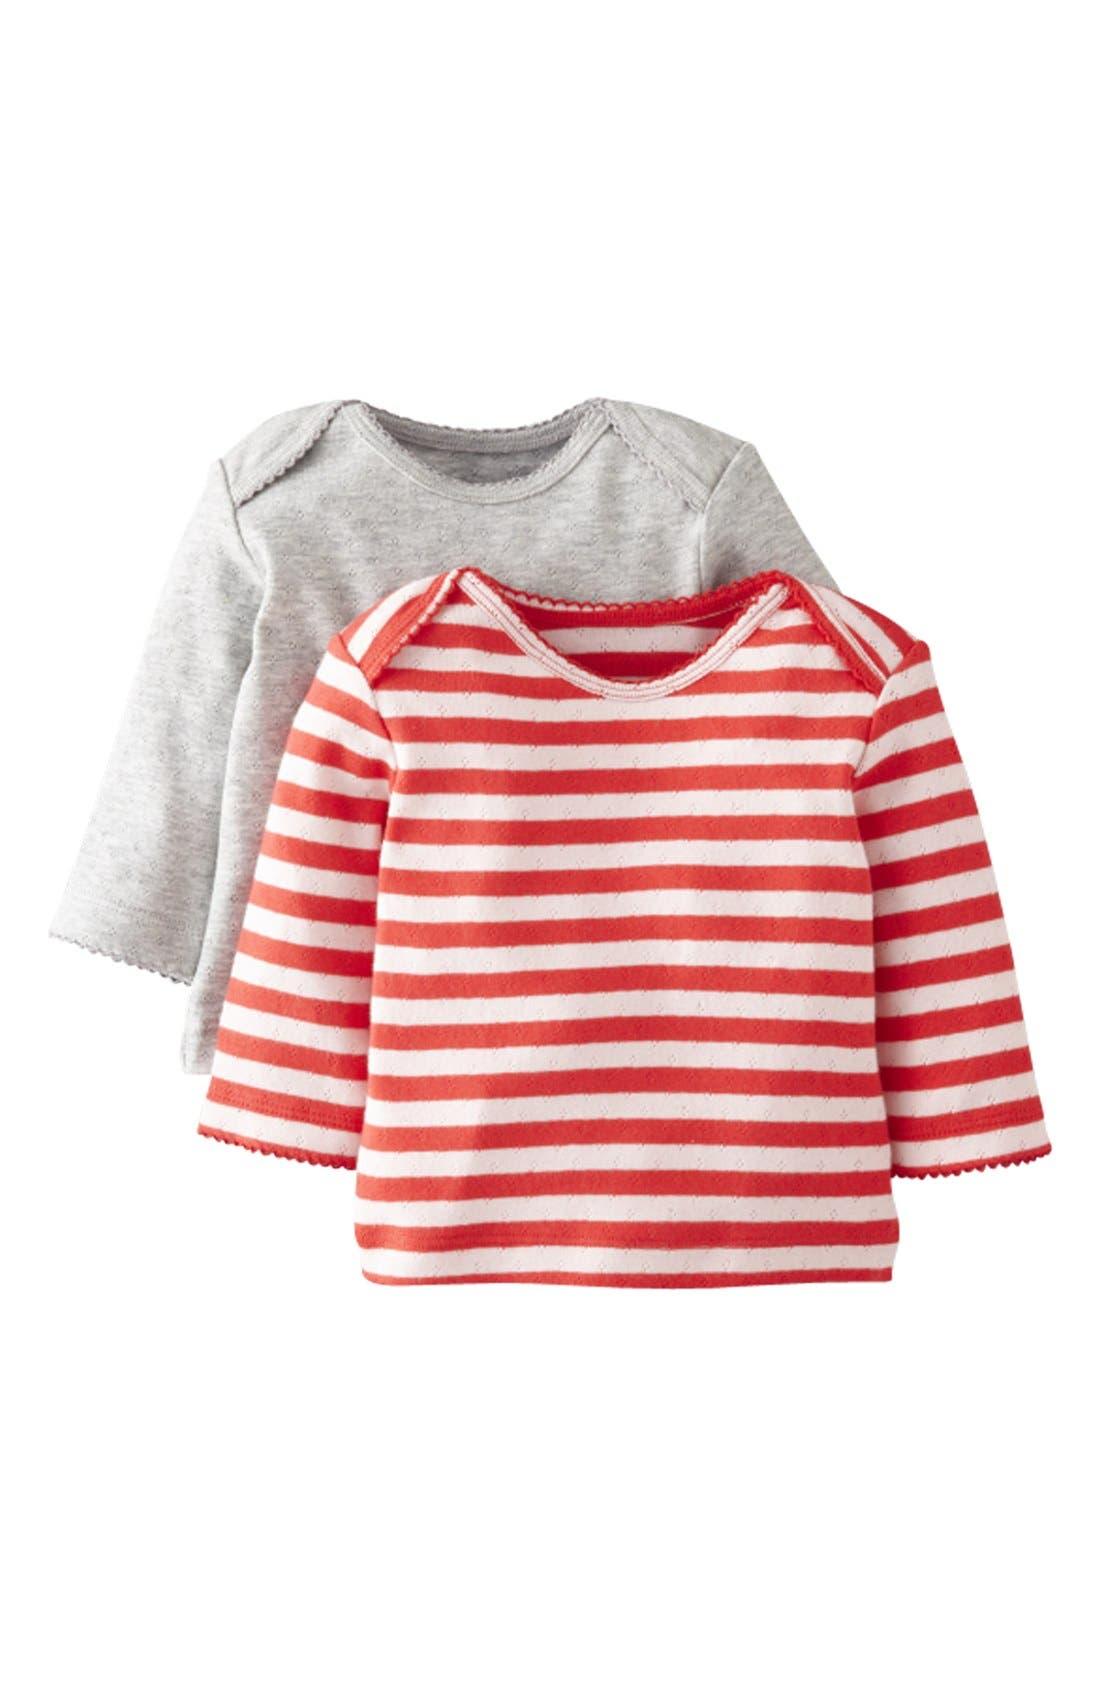 Main Image - Mini Boden Pointelle Tee (2-Pack) (Baby Girls)